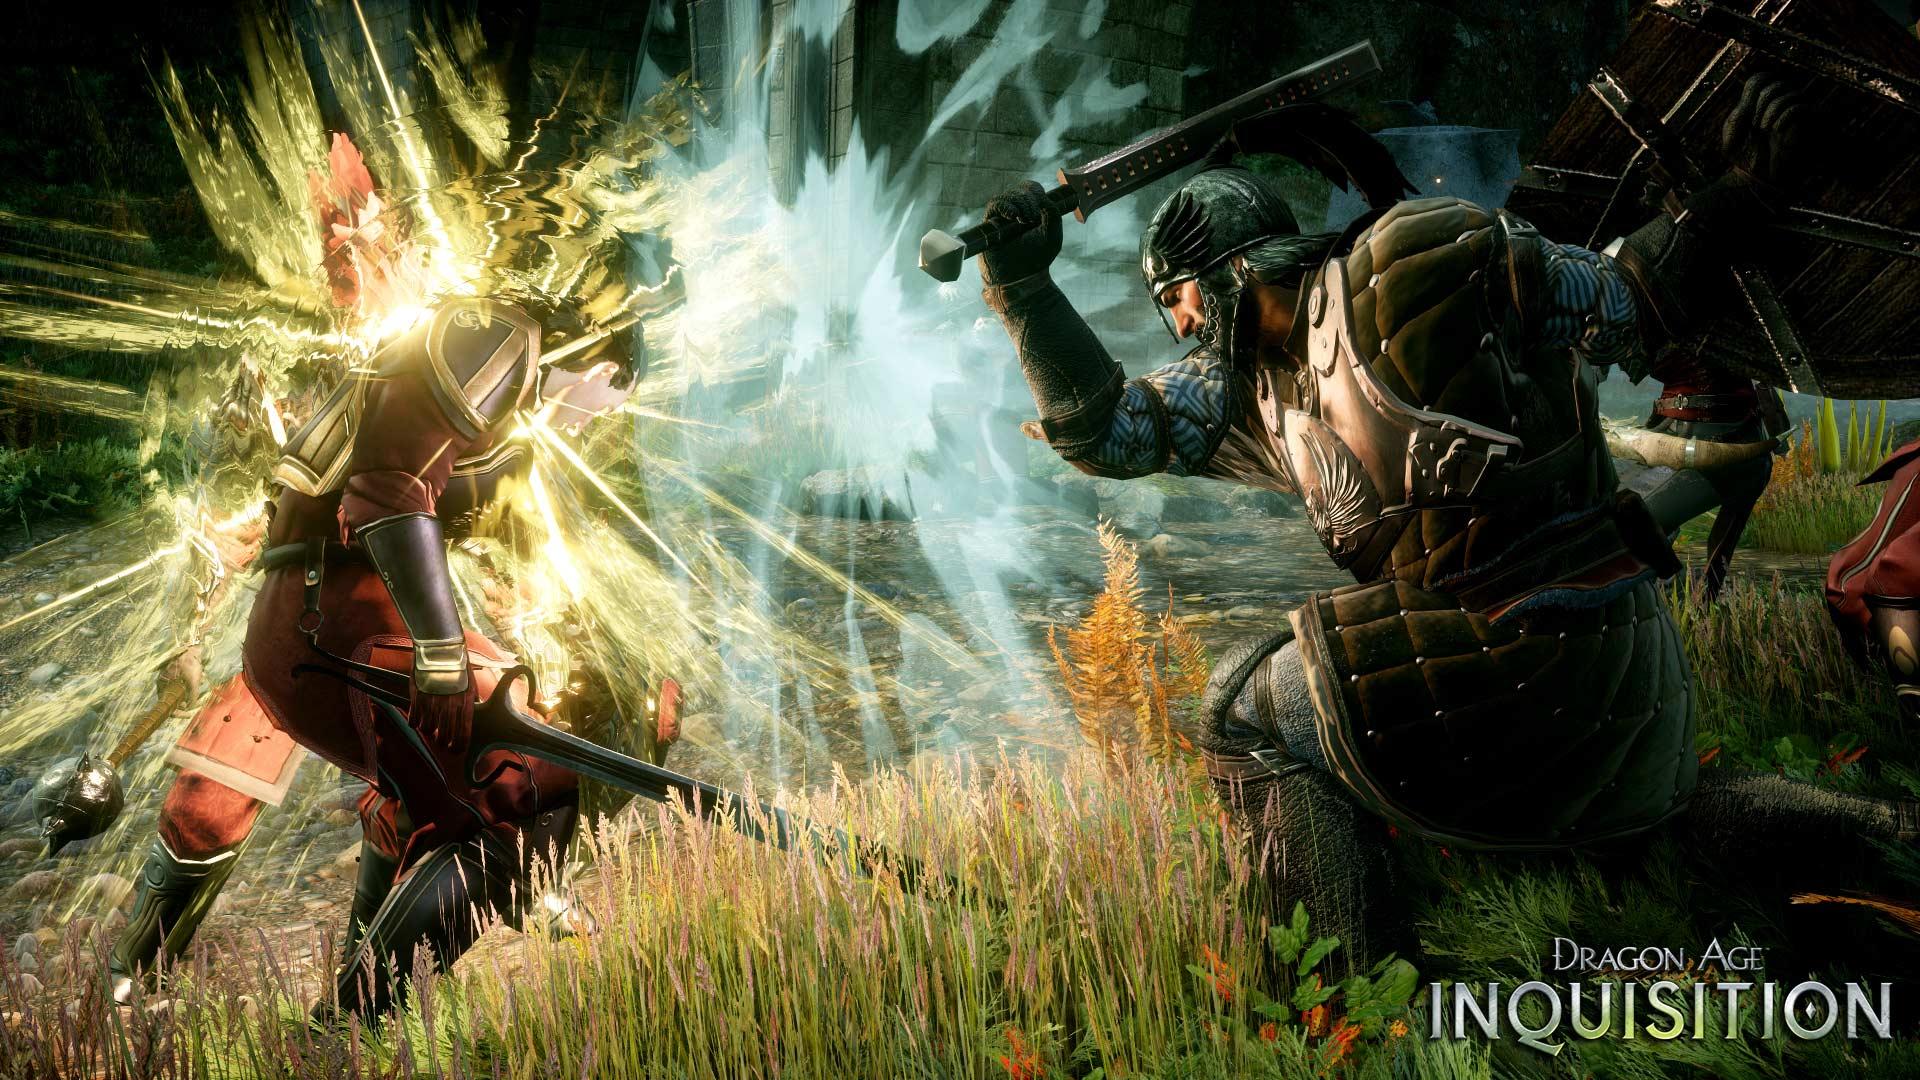 Bioware dragon age inquisition patch download torrent